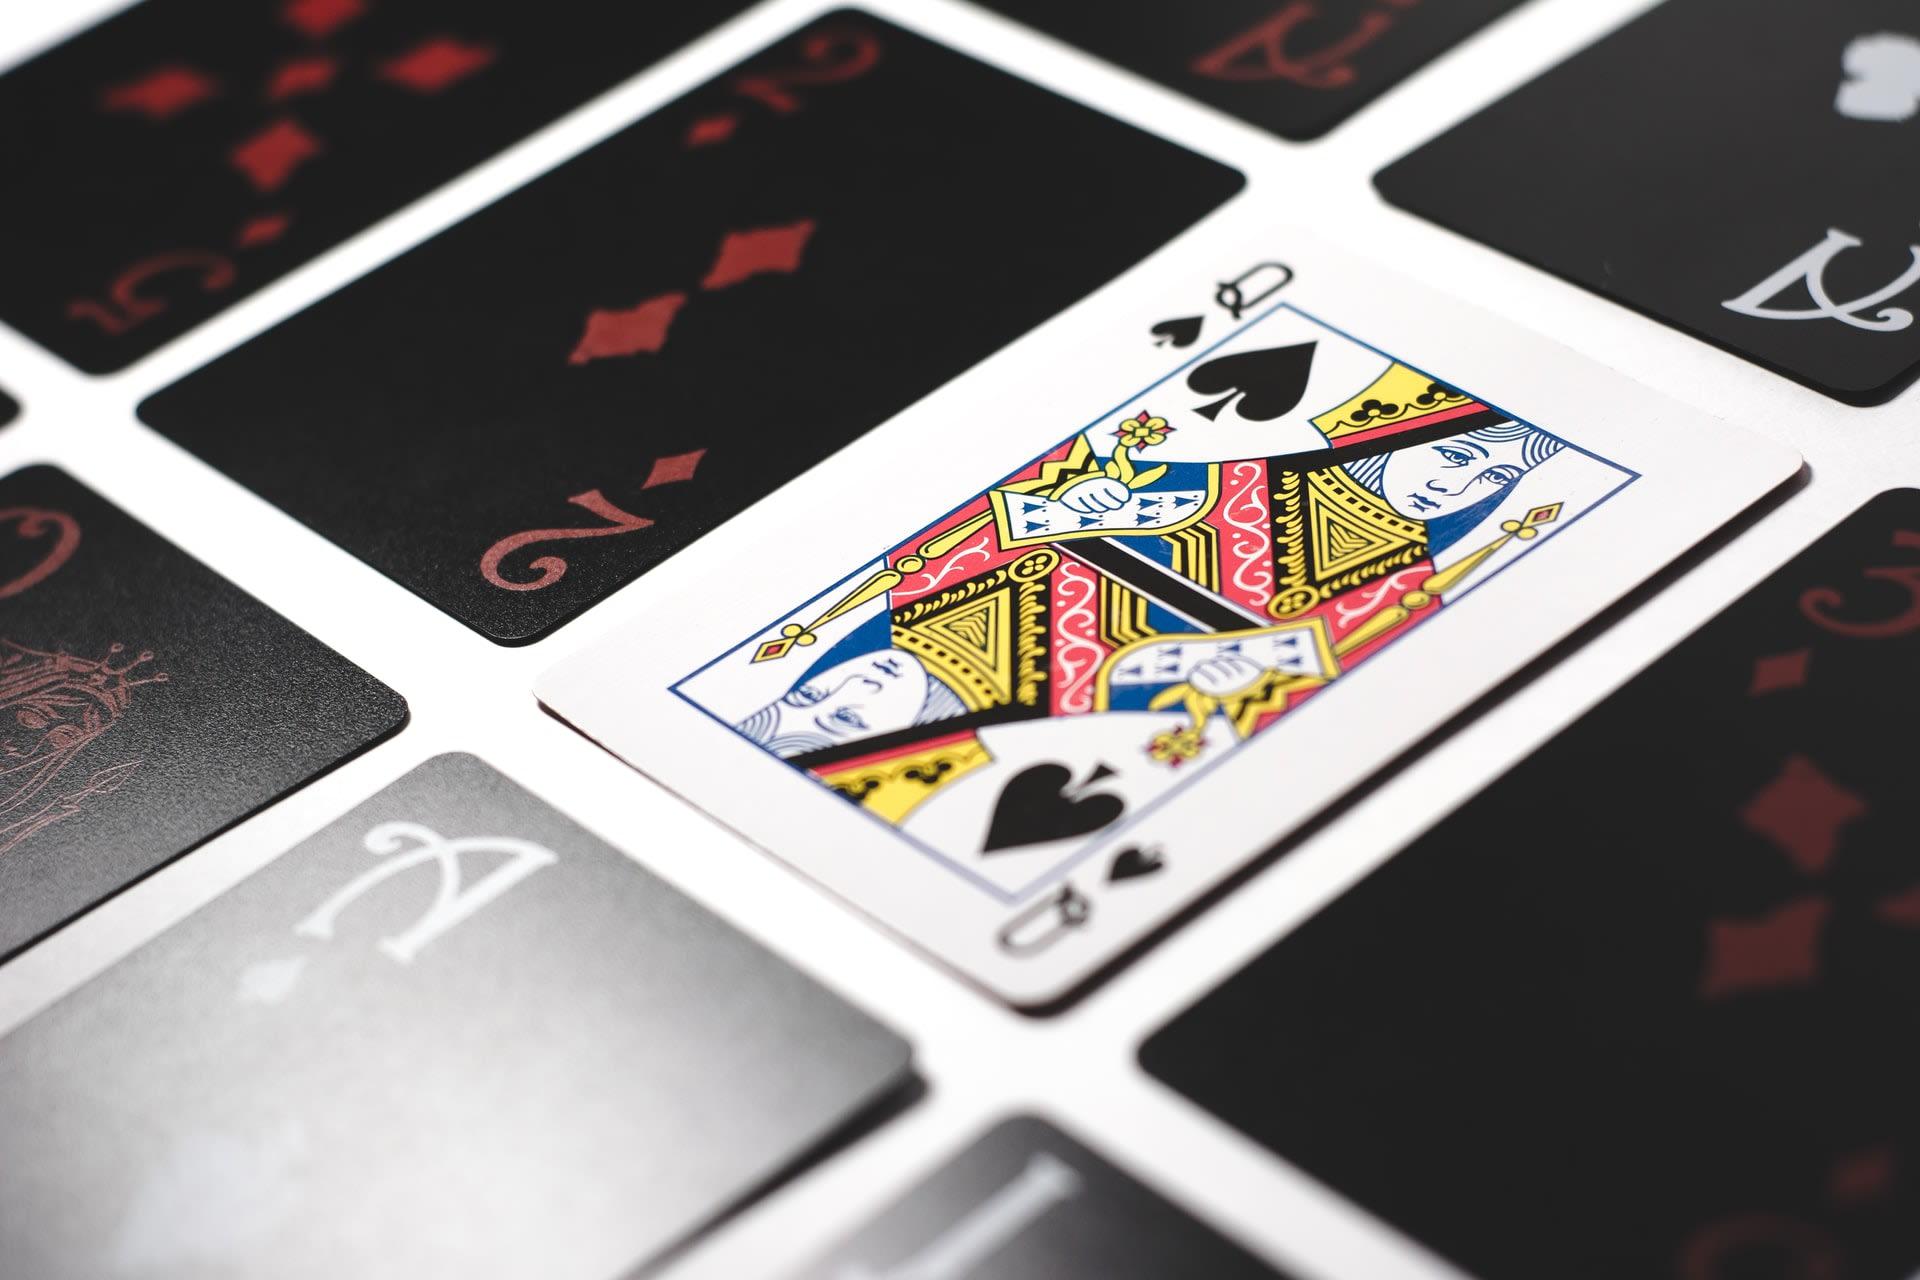 Pragmatic Play adds Blackjack and Azure Roulette to their Live Casino portfolio